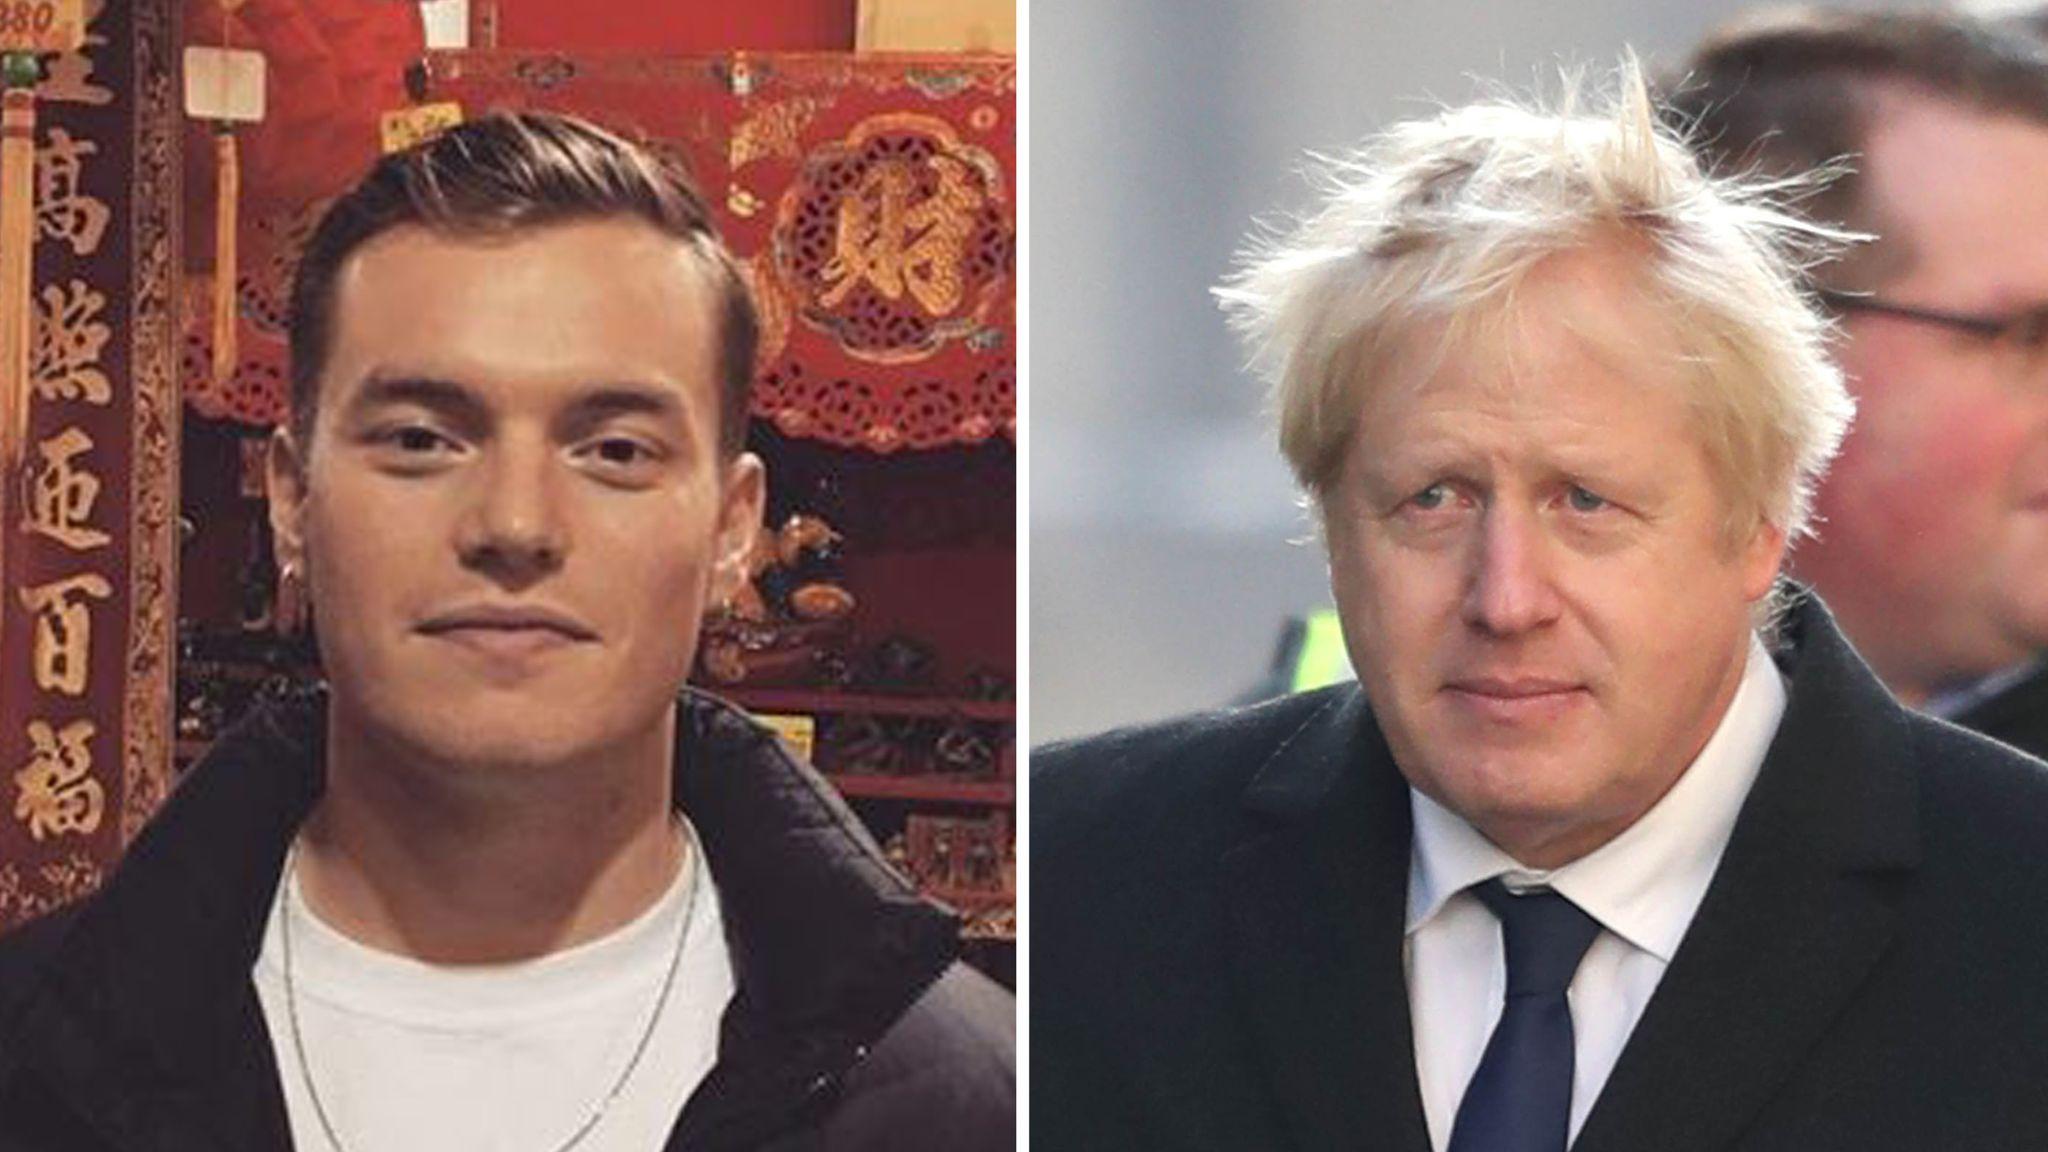 London Bridge victim Jack Merritt's father accuses Boris Johnson of lying